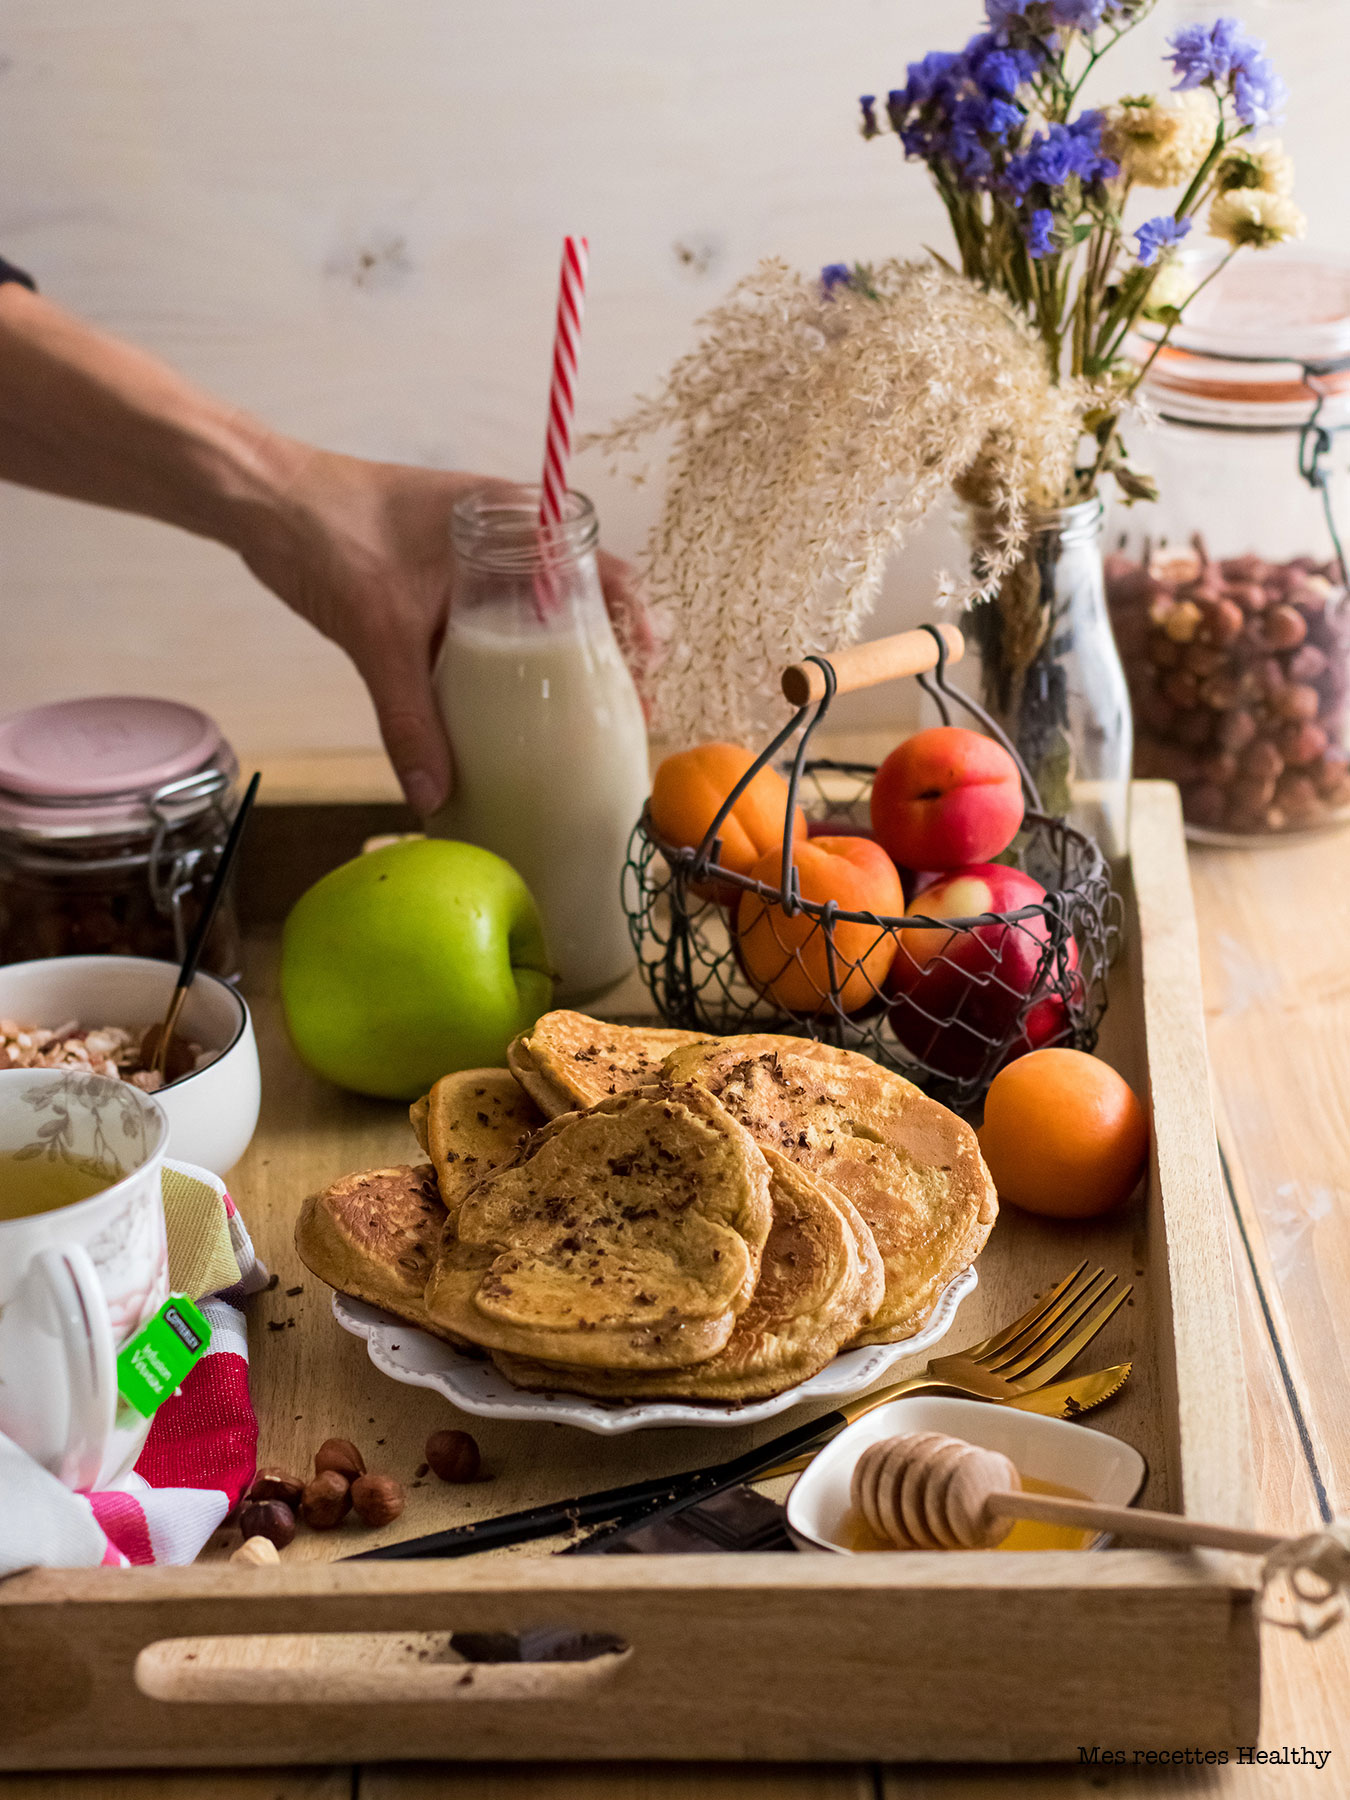 recette healthy-pancake moelleux-banane-brunch